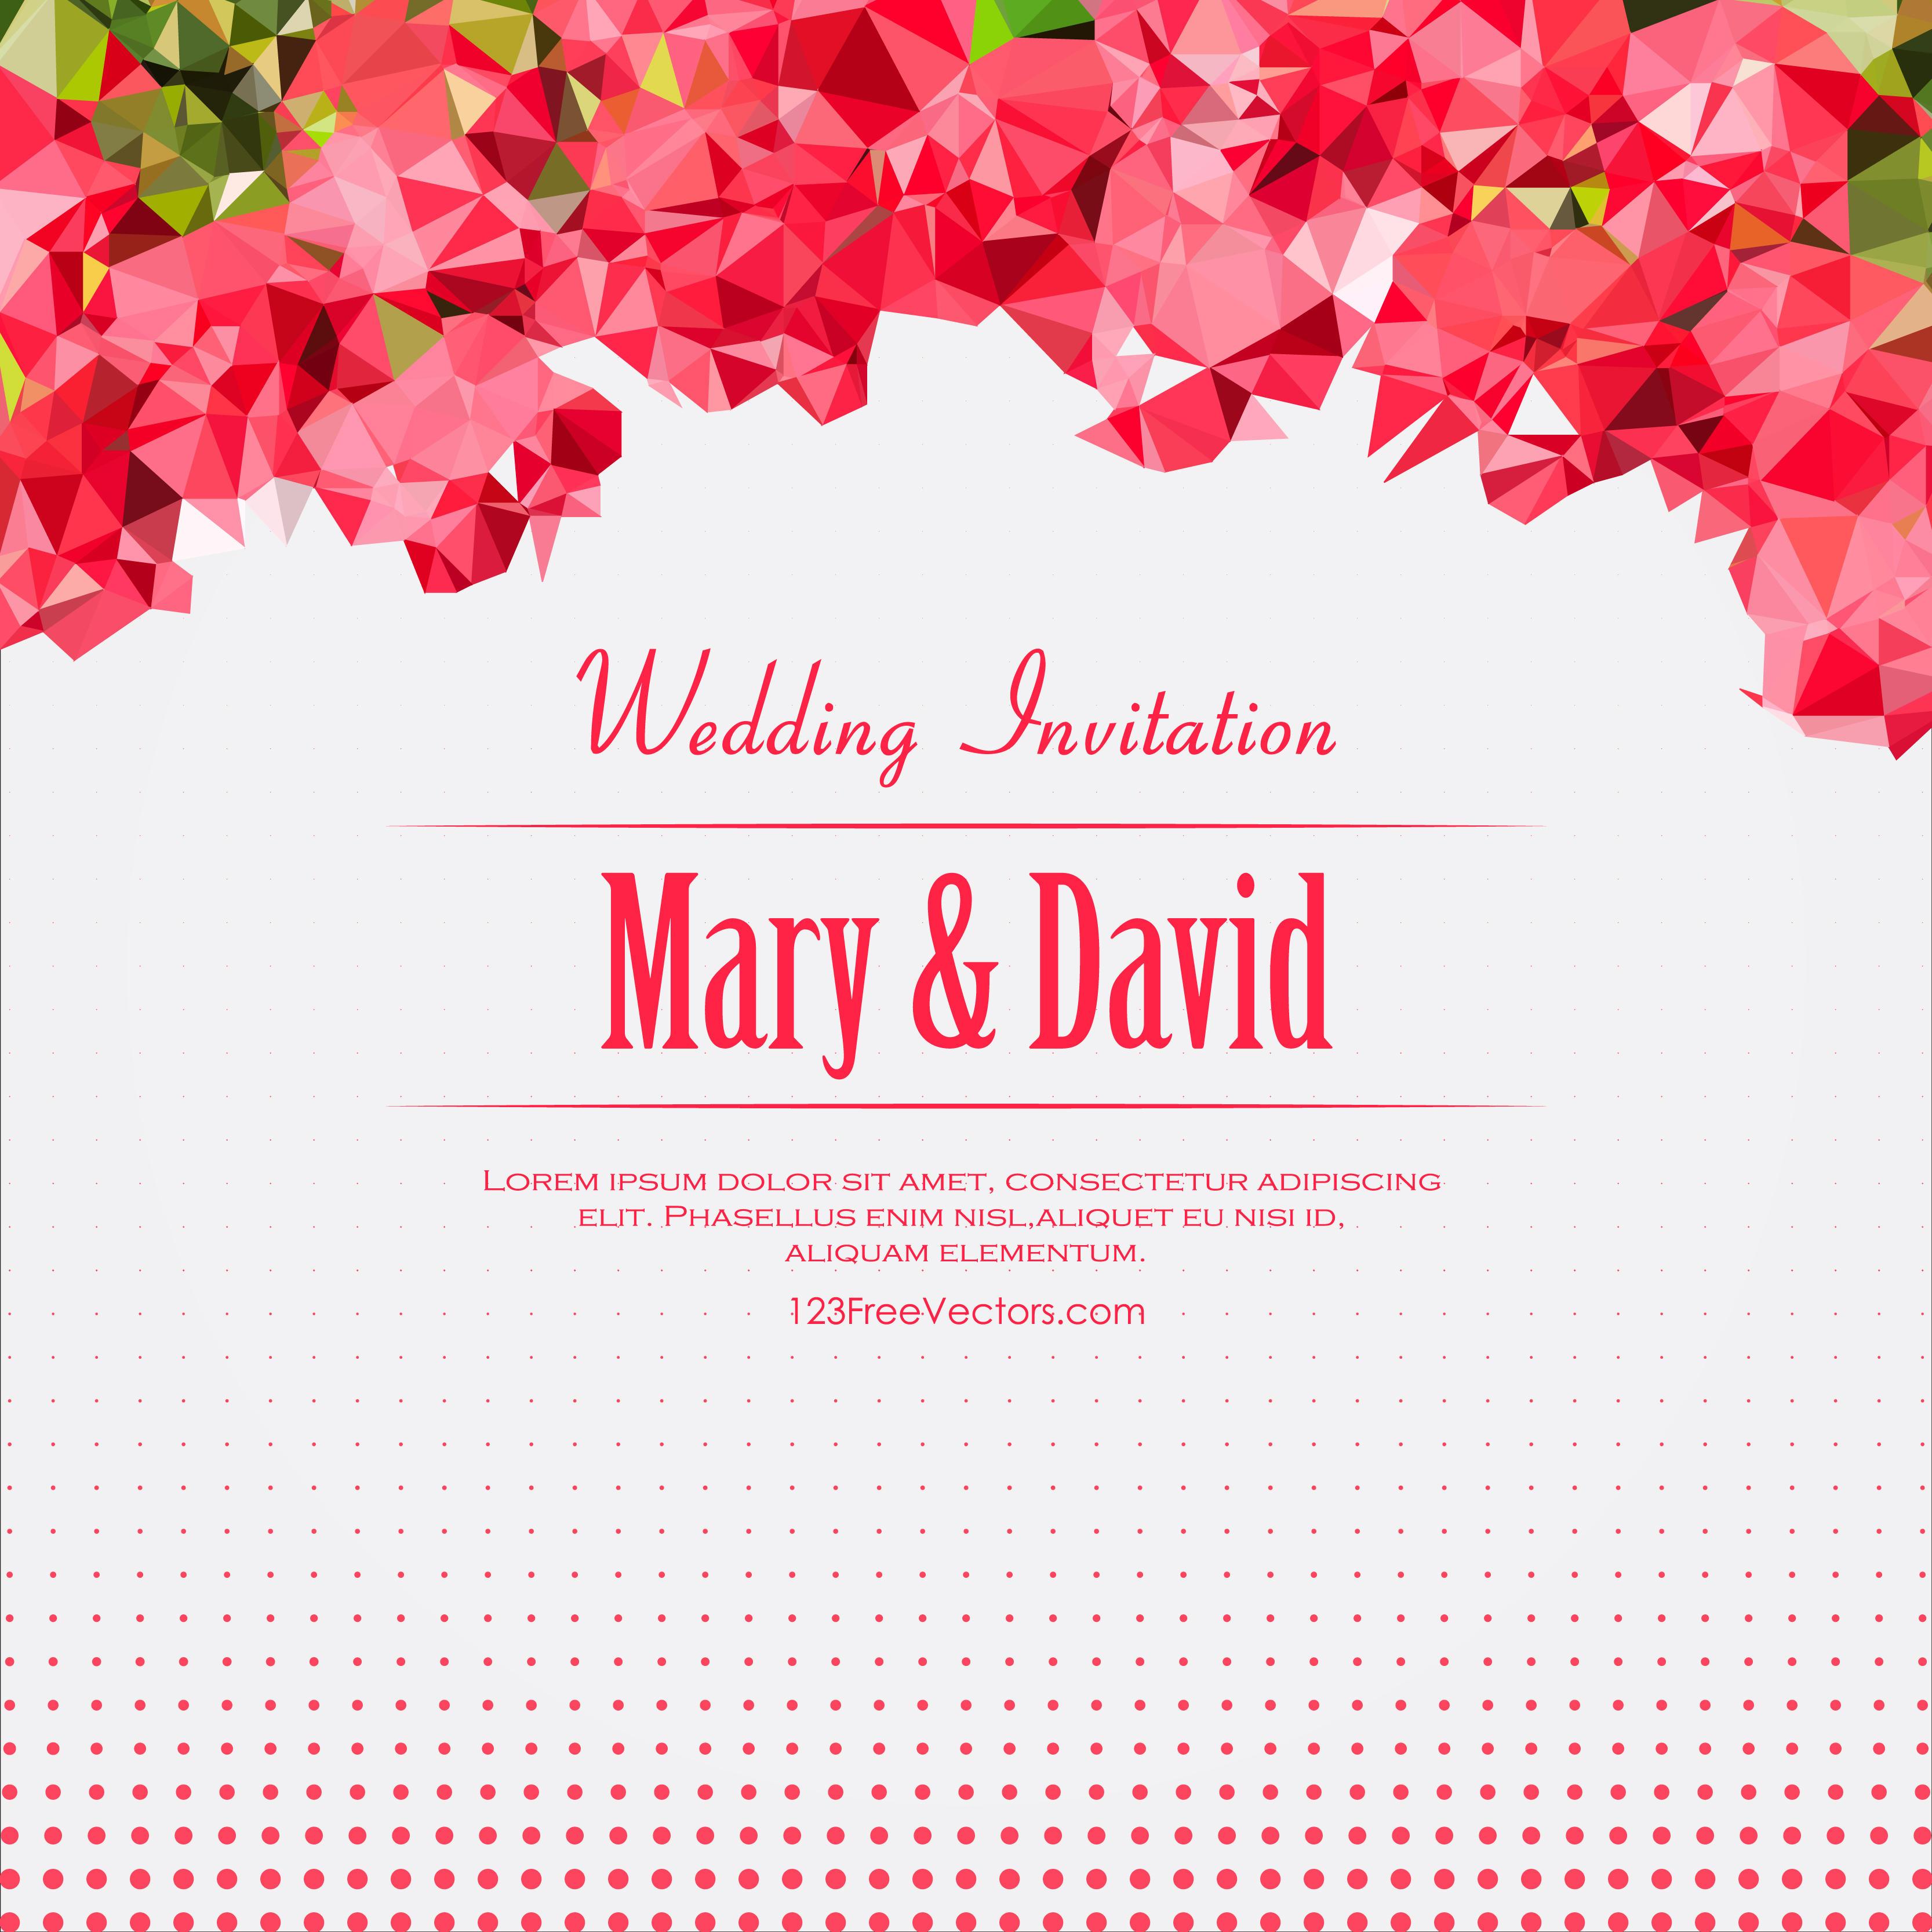 Wedding Invitation Card 75 Trend Abstract Pink Polygonal Wedding